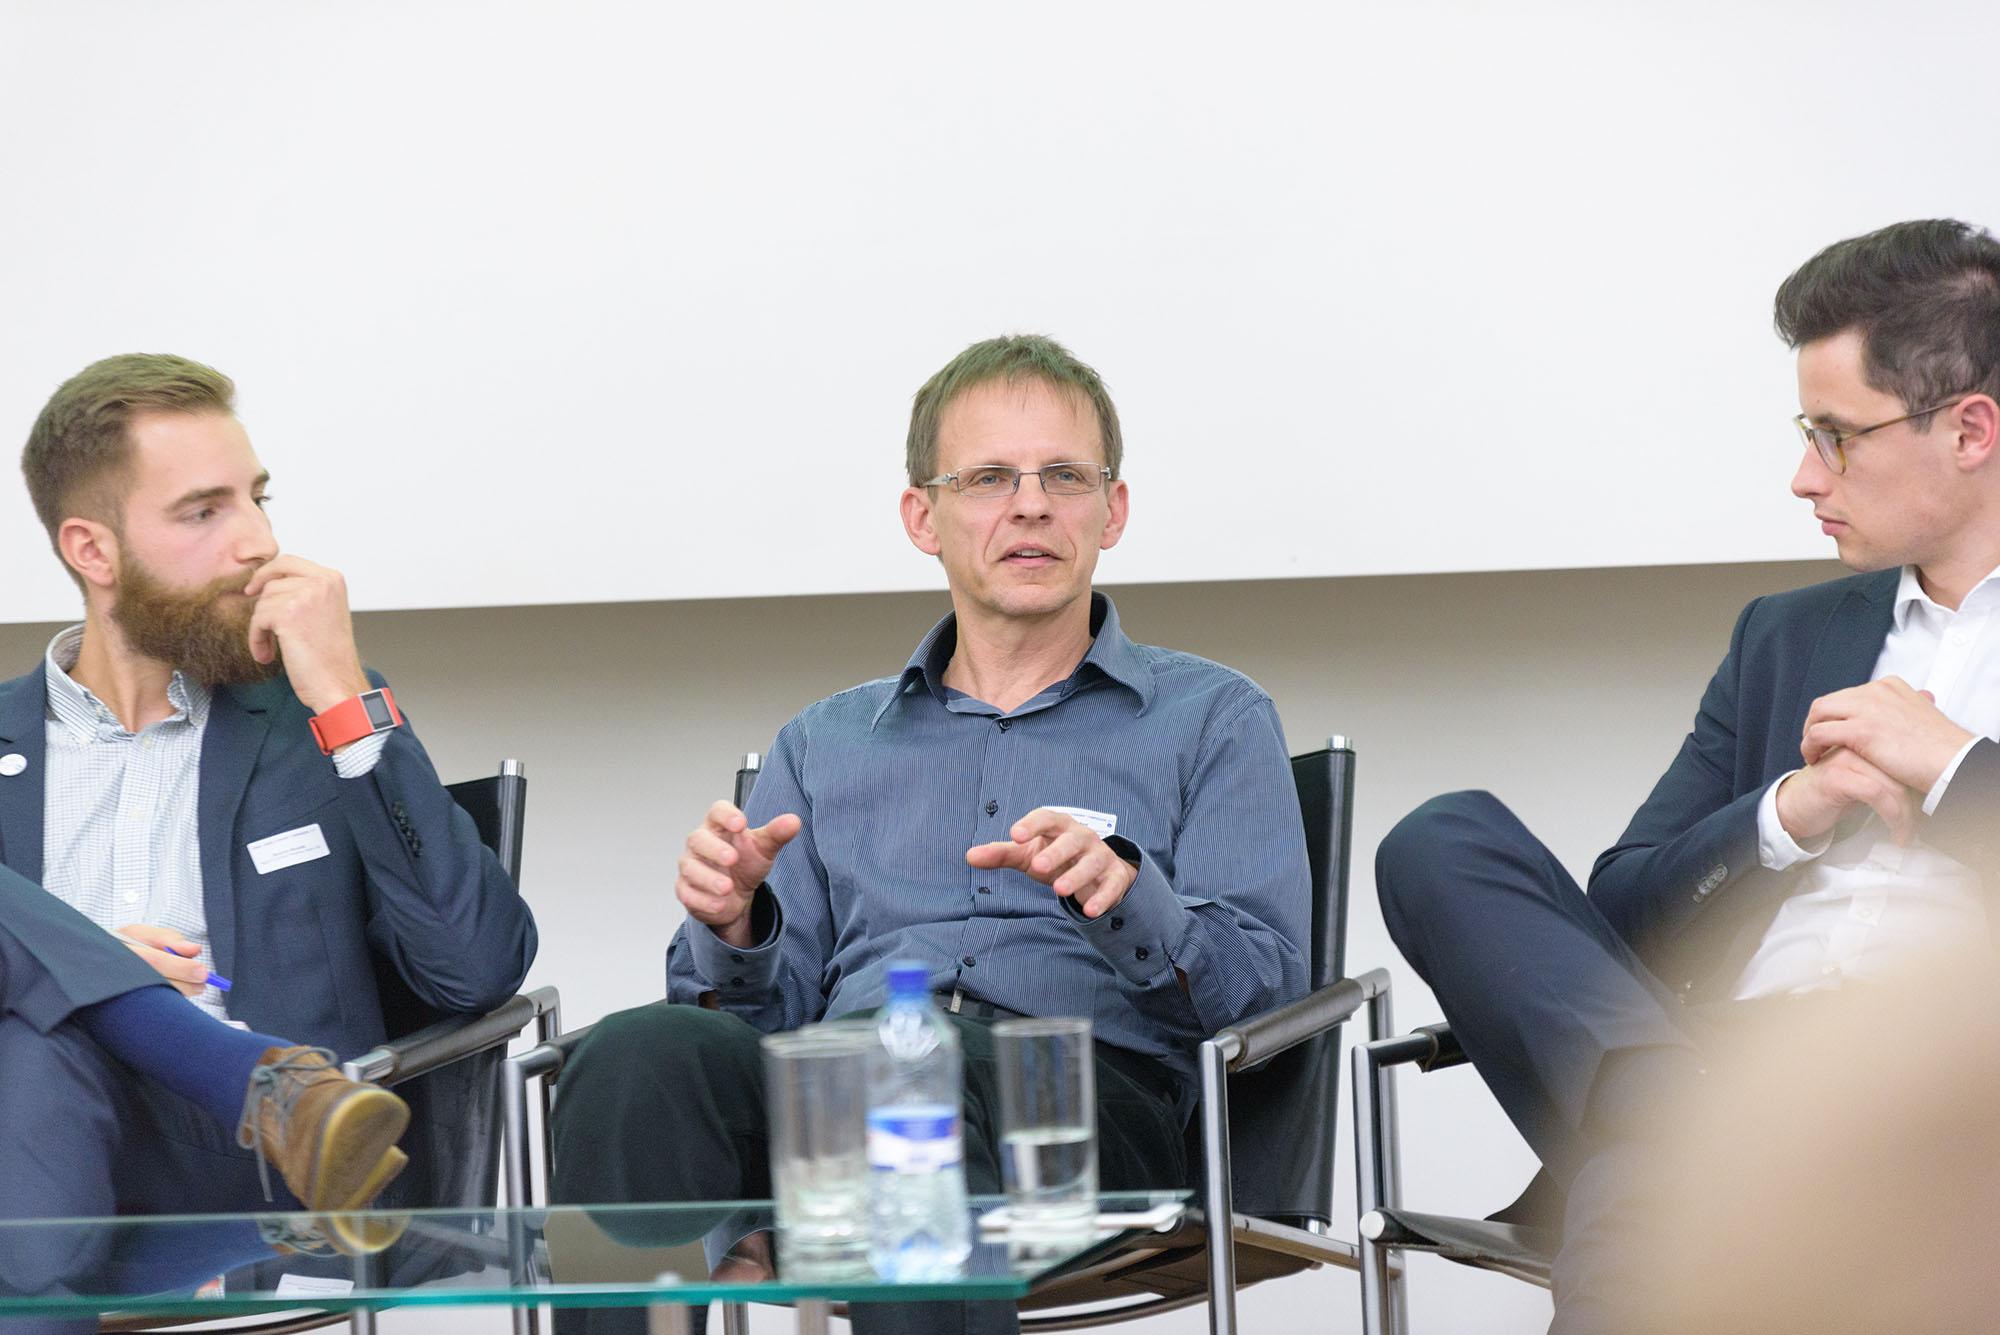 Riccardo Decarolis, Beat Koch, Jan Bieser